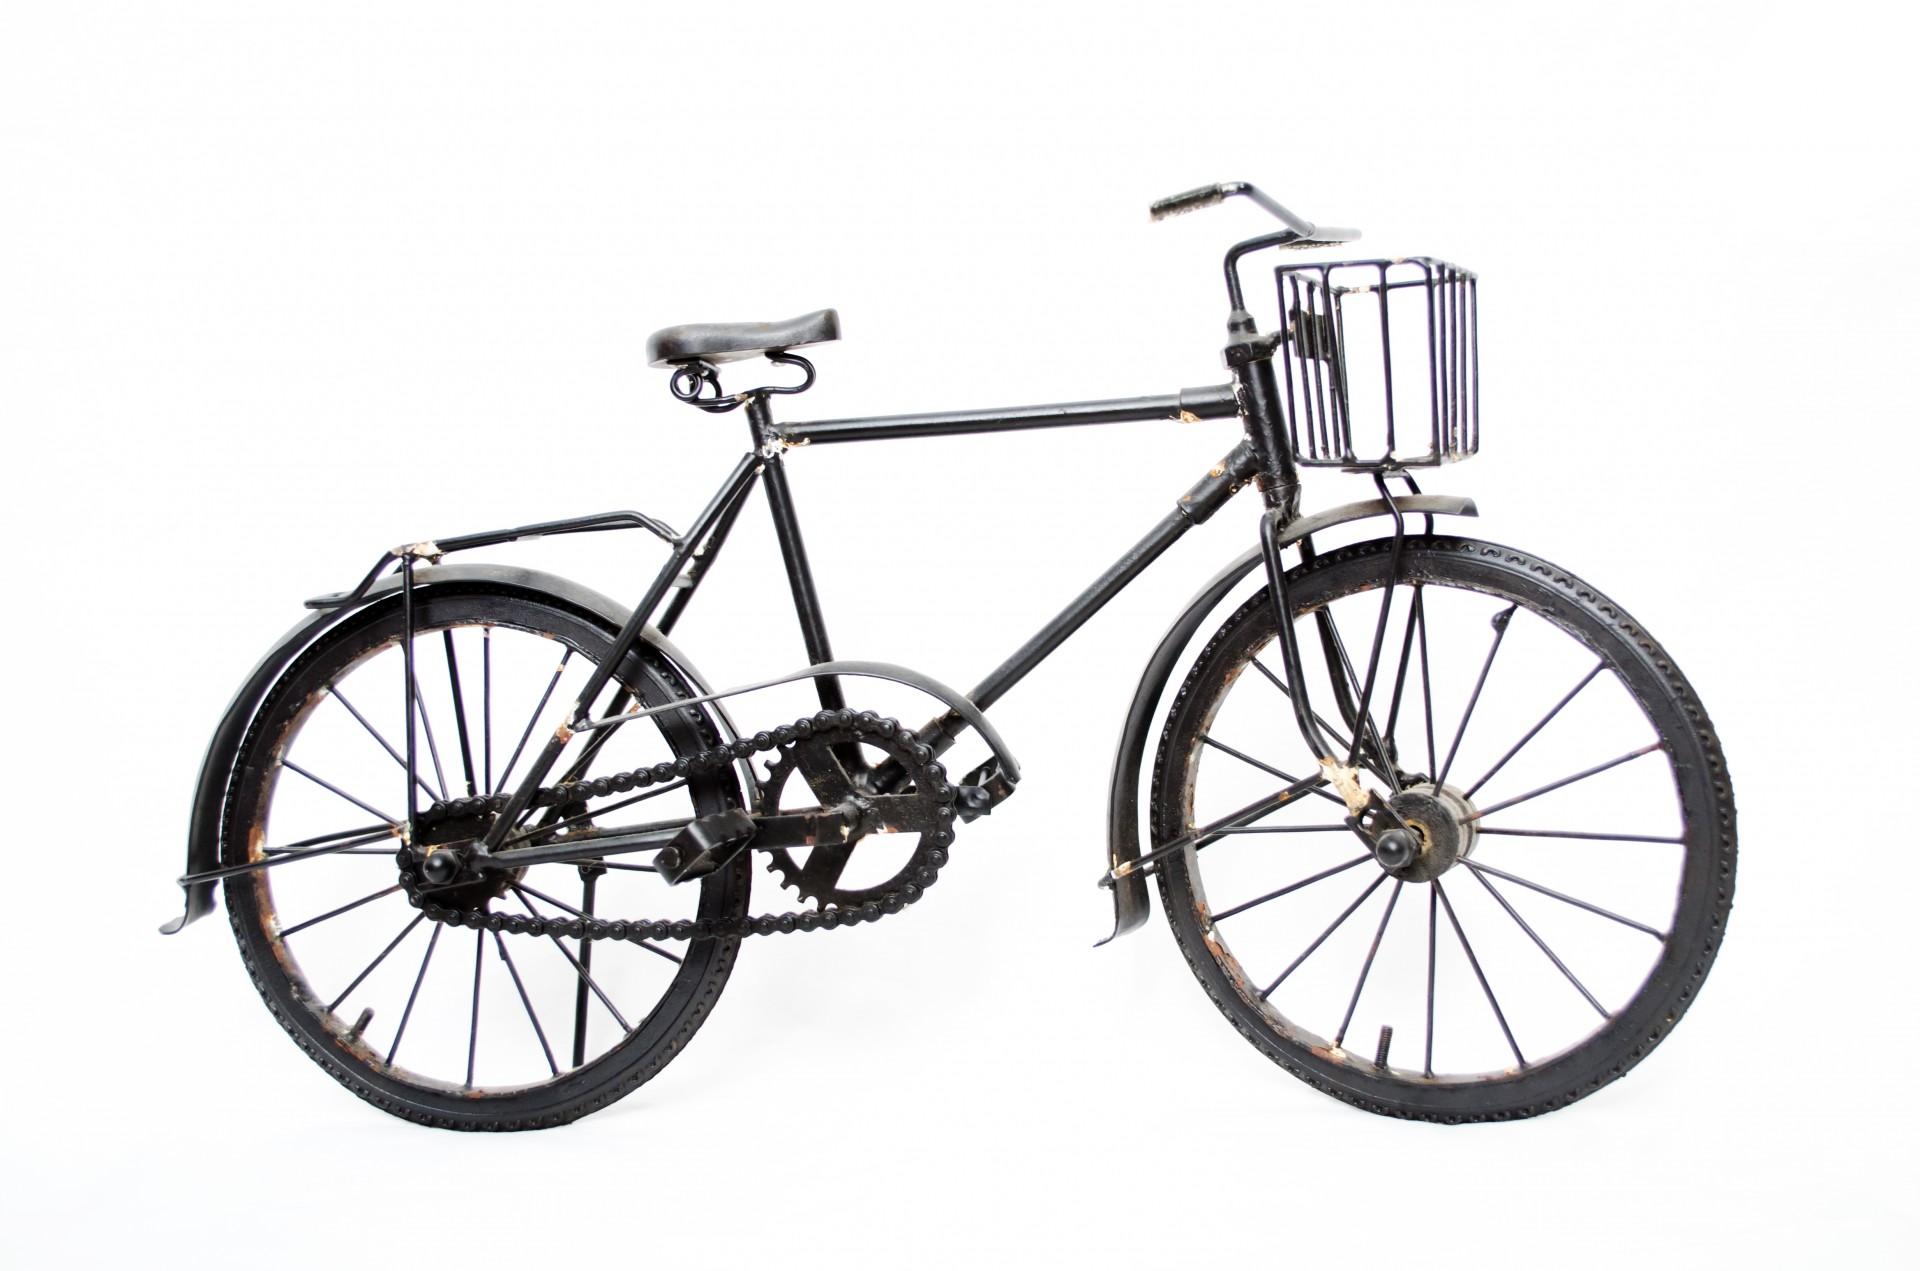 Old Bike Free Stock Photo